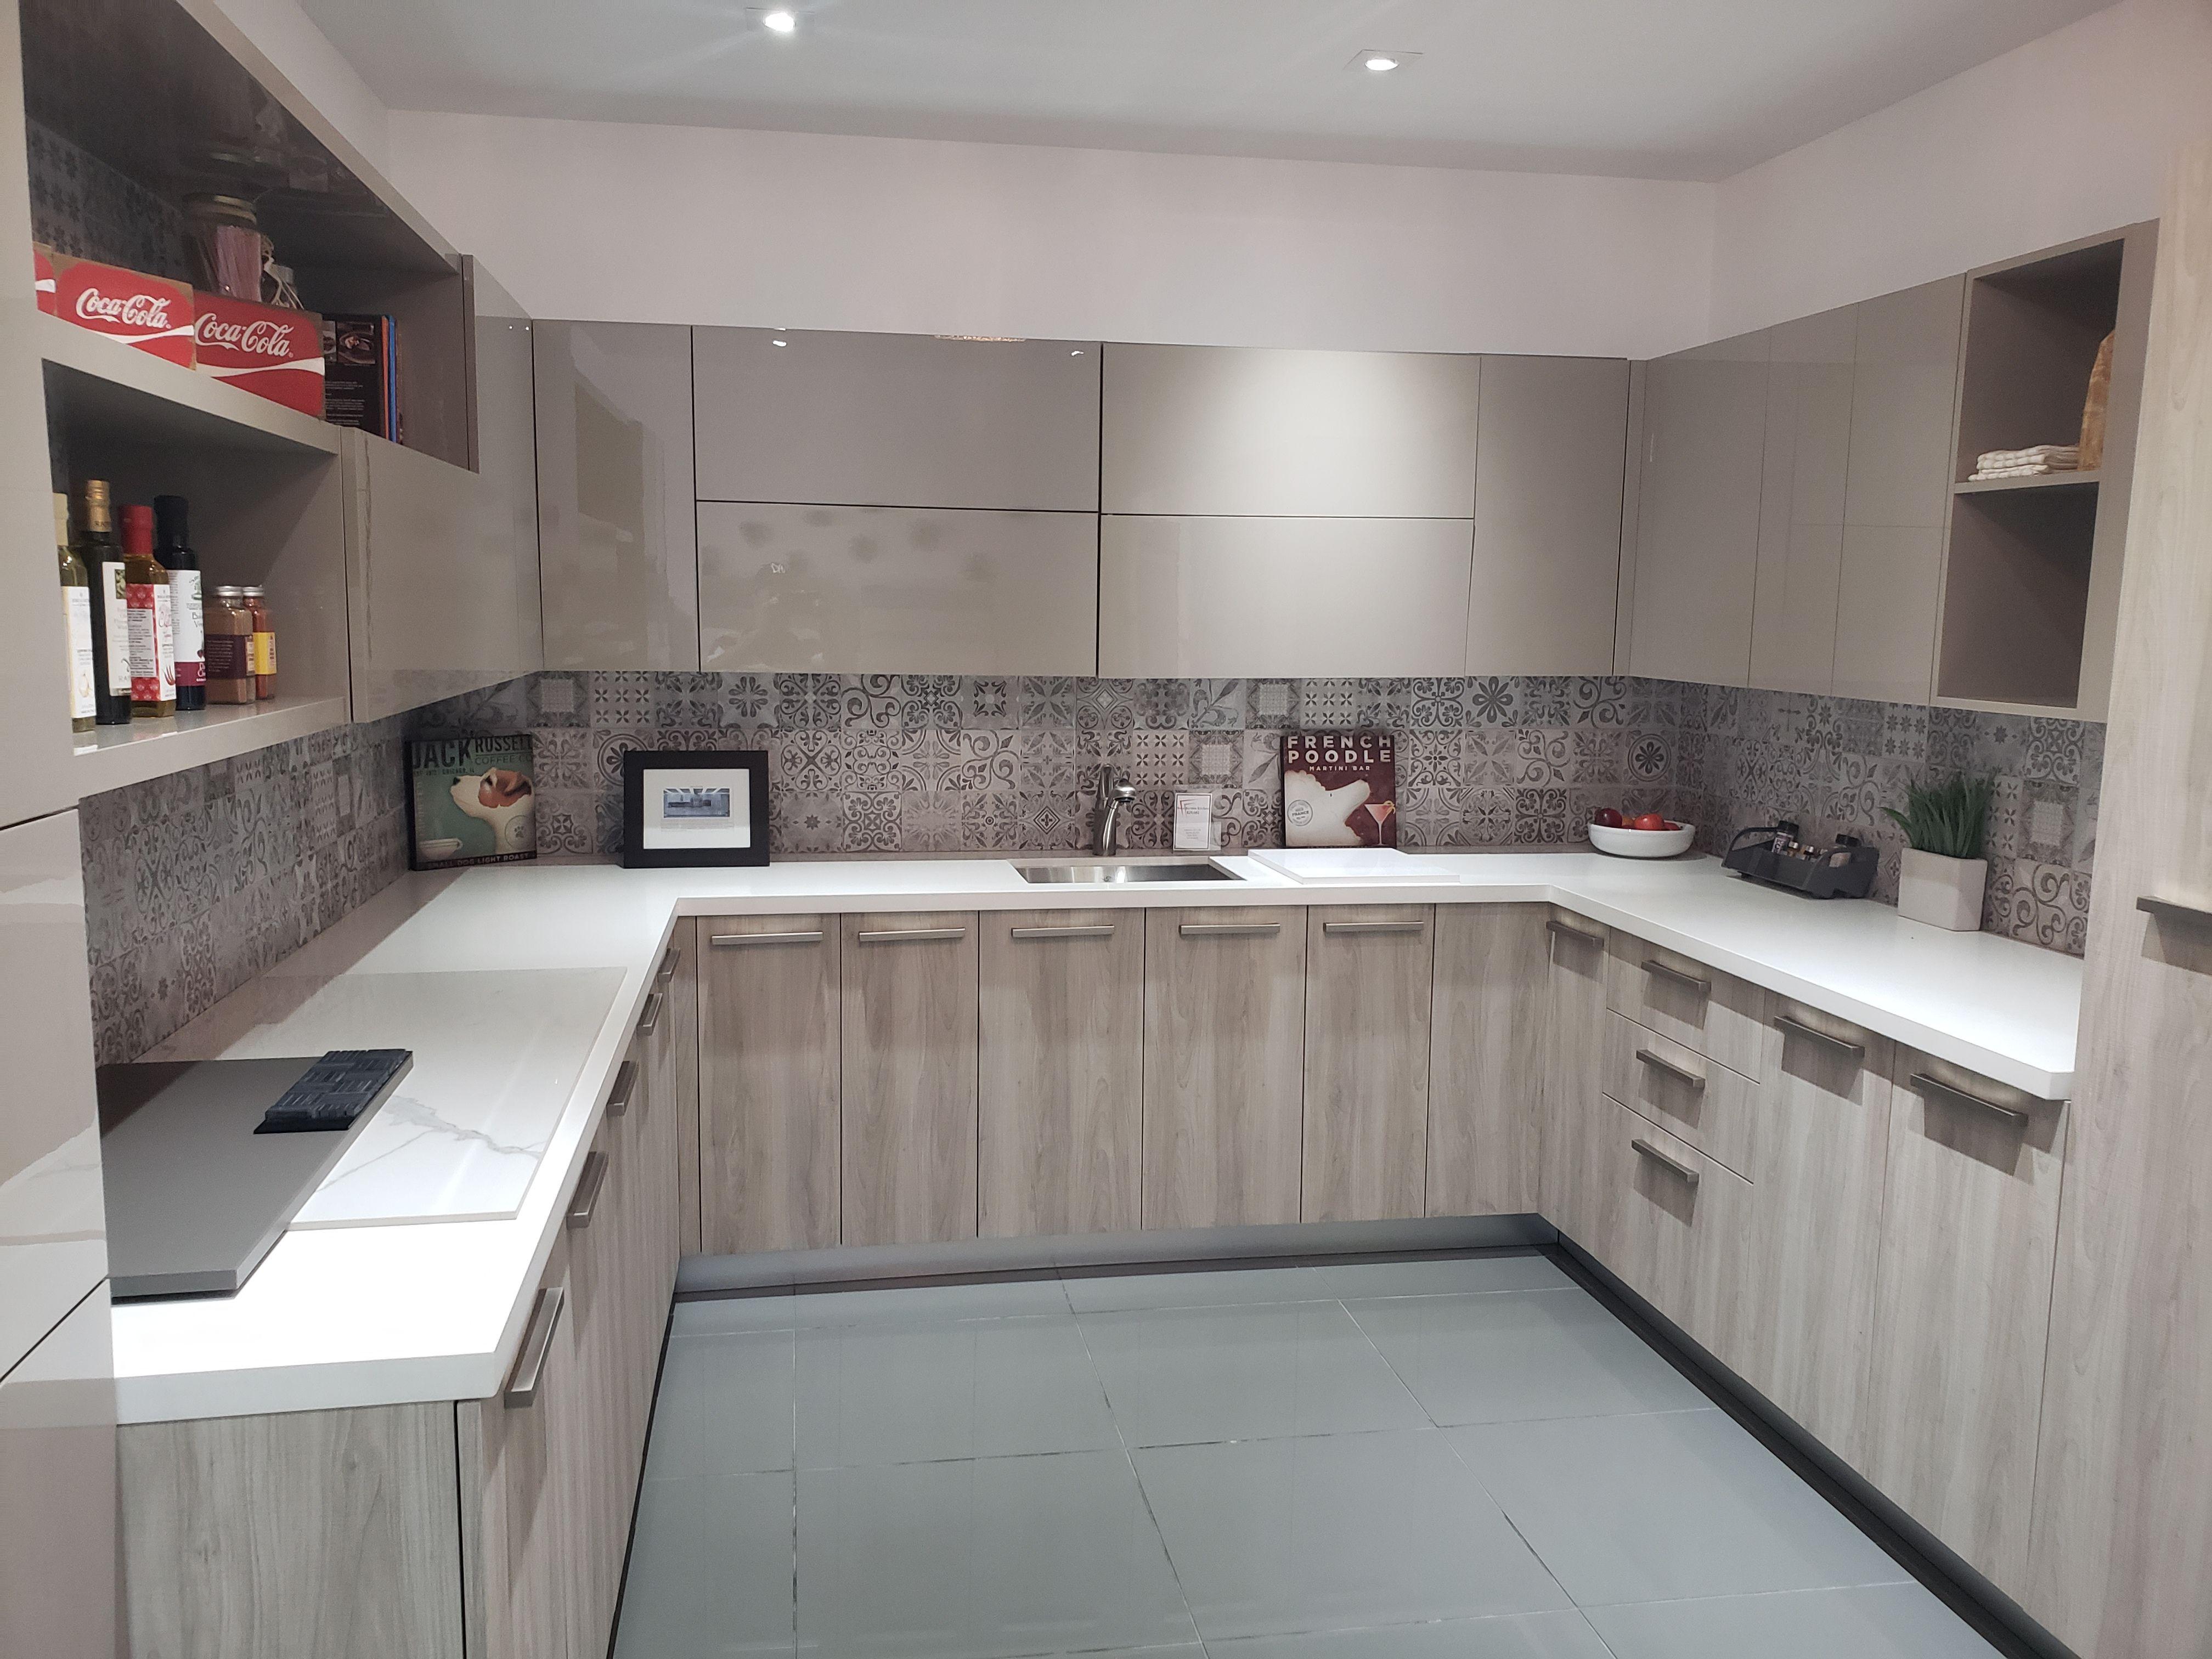 Modern Kitchen Cabinets Modern Kitchen Cabinets Kitchen Bathroom Remodel Commercial Renovation